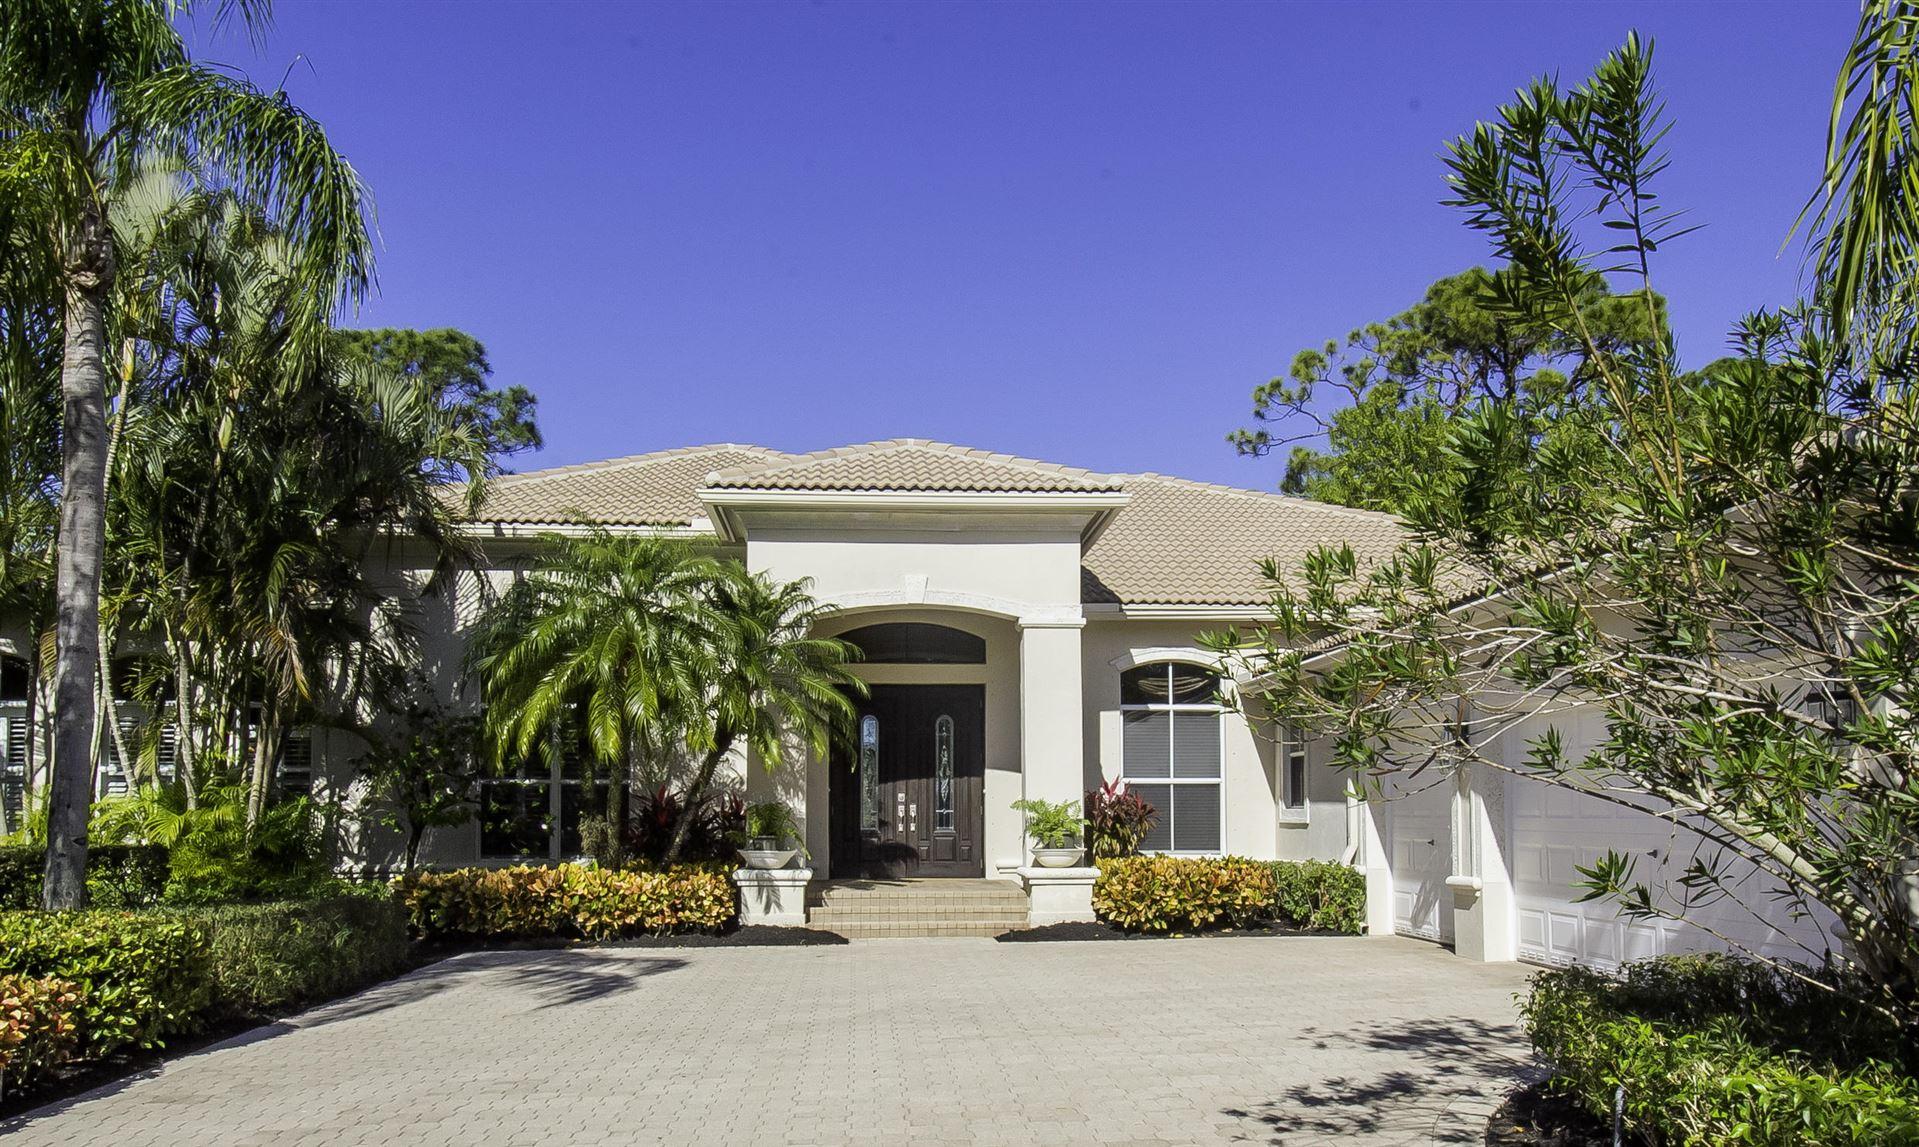 Photo of 7787 Ironhorse Boulevard, West Palm Beach, FL 33412 (MLS # RX-10687083)